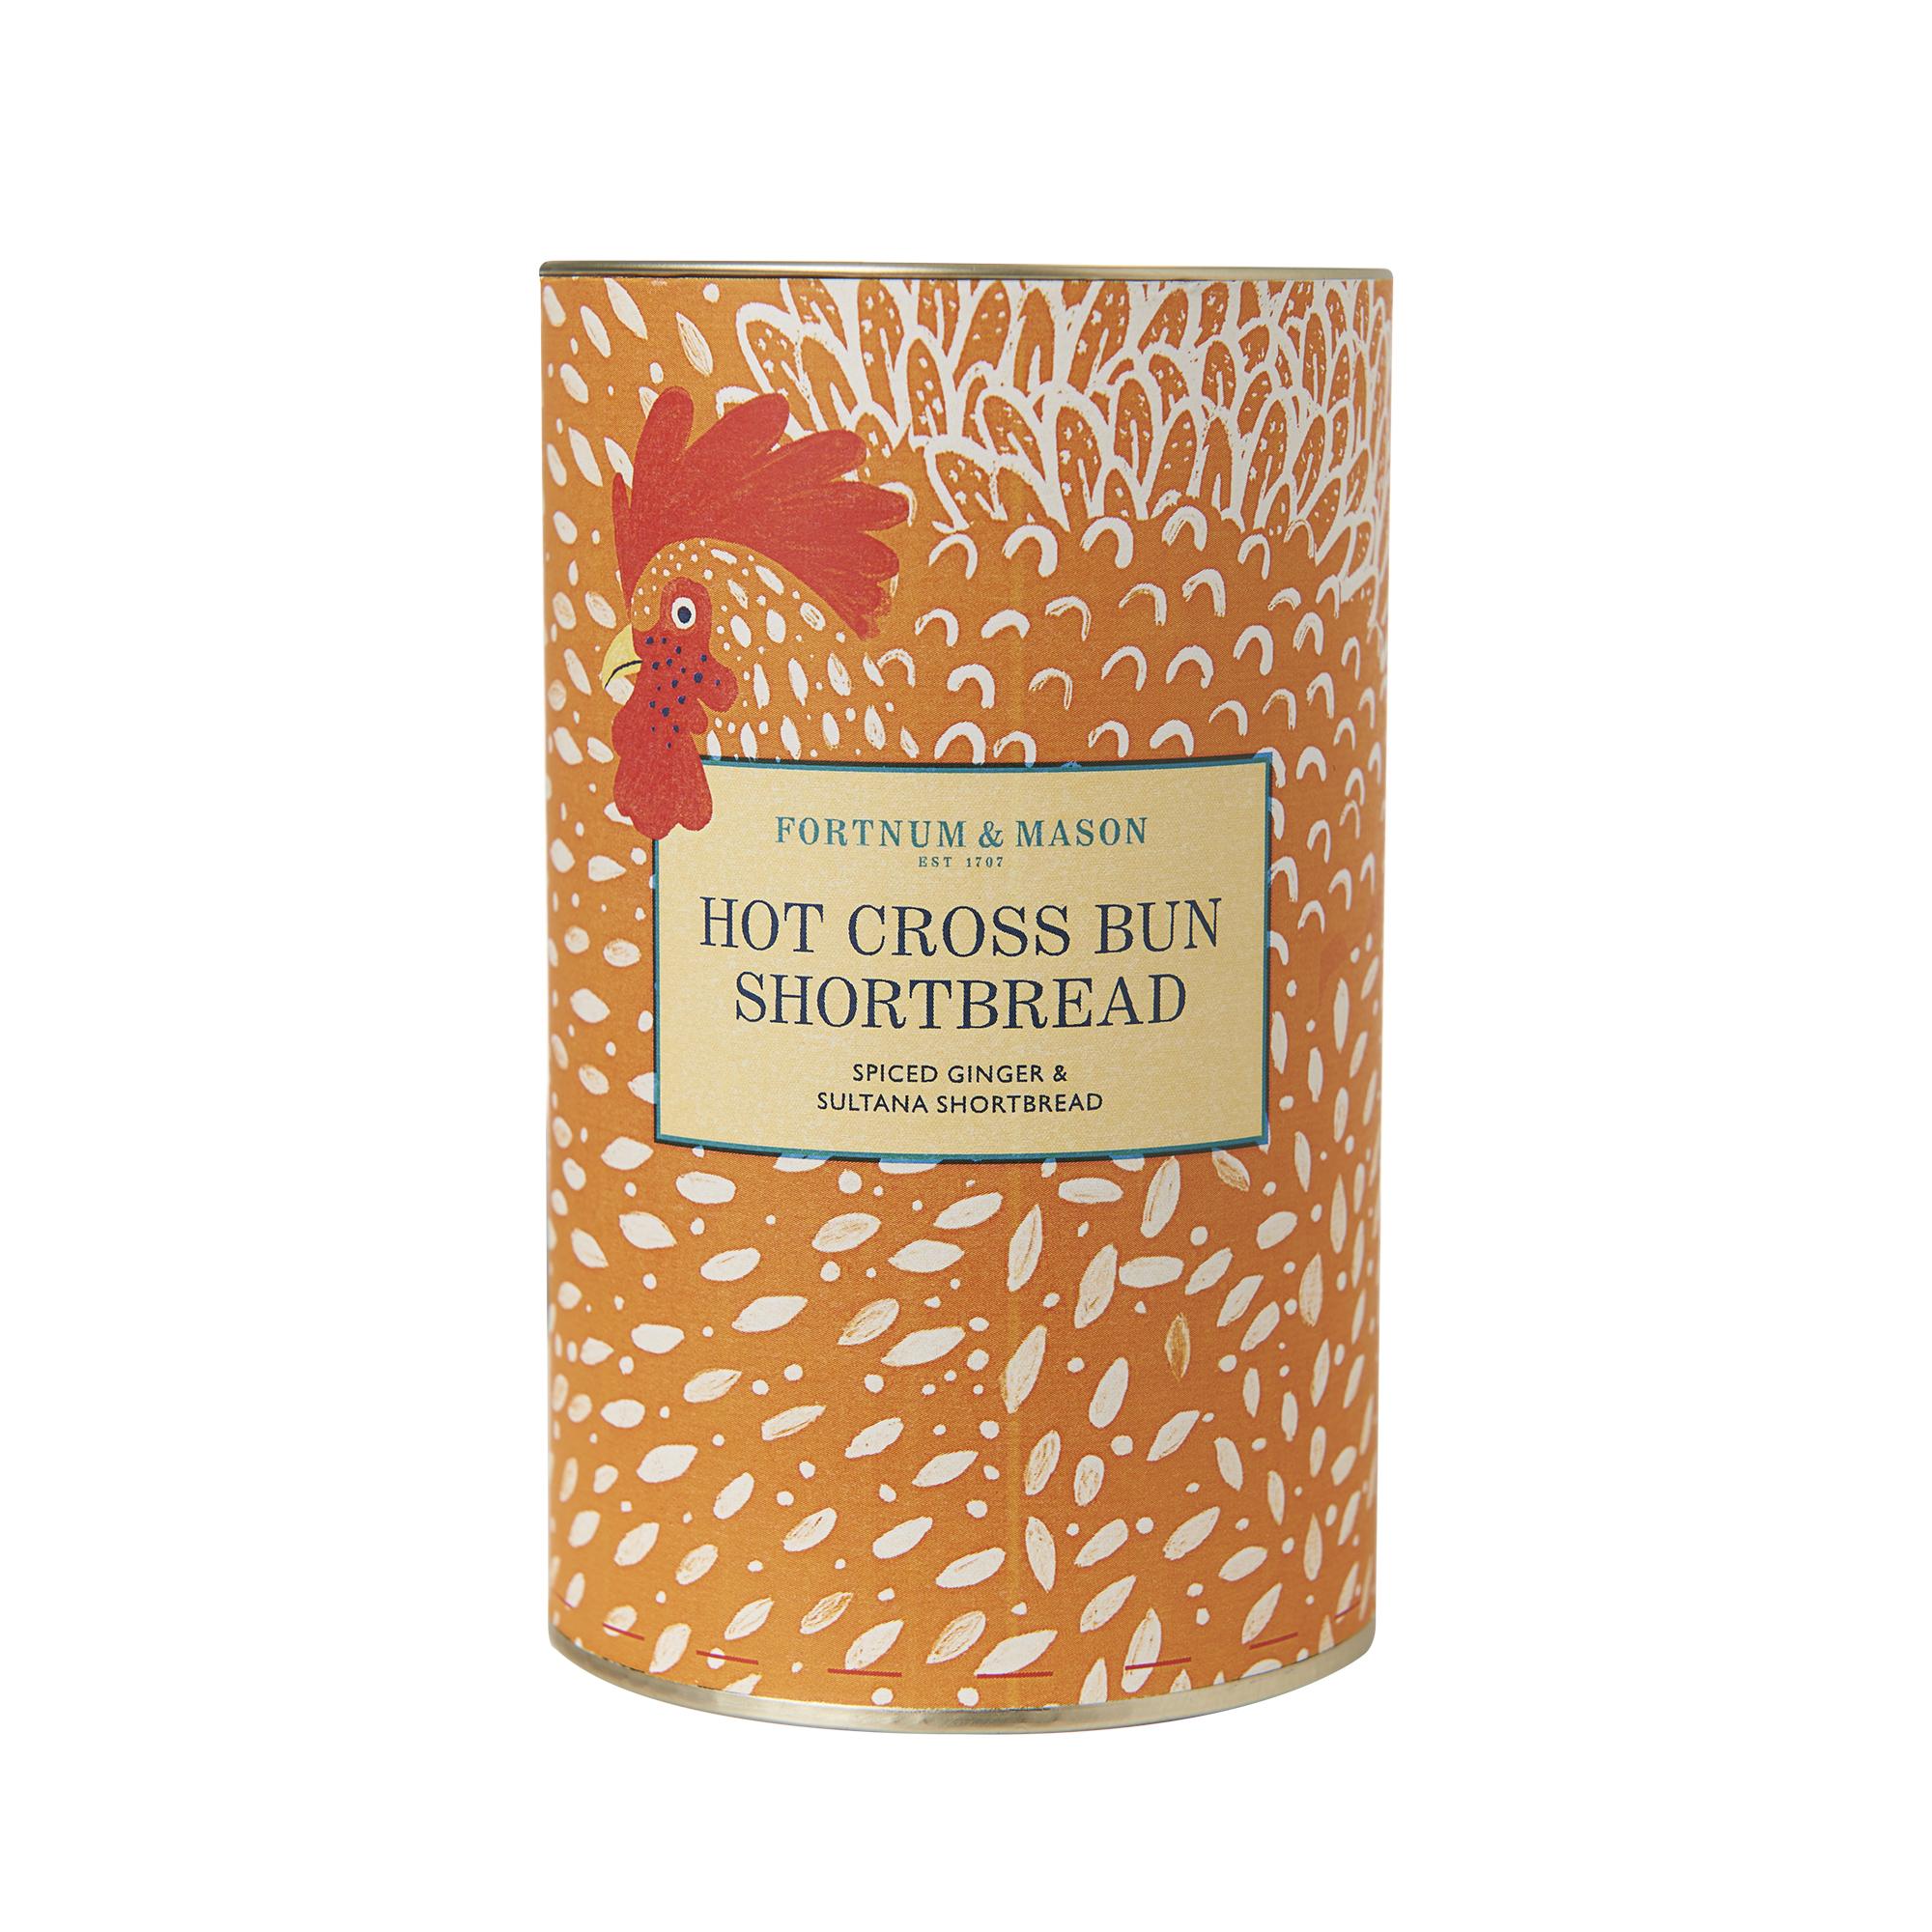 Hot Cross Shortbread